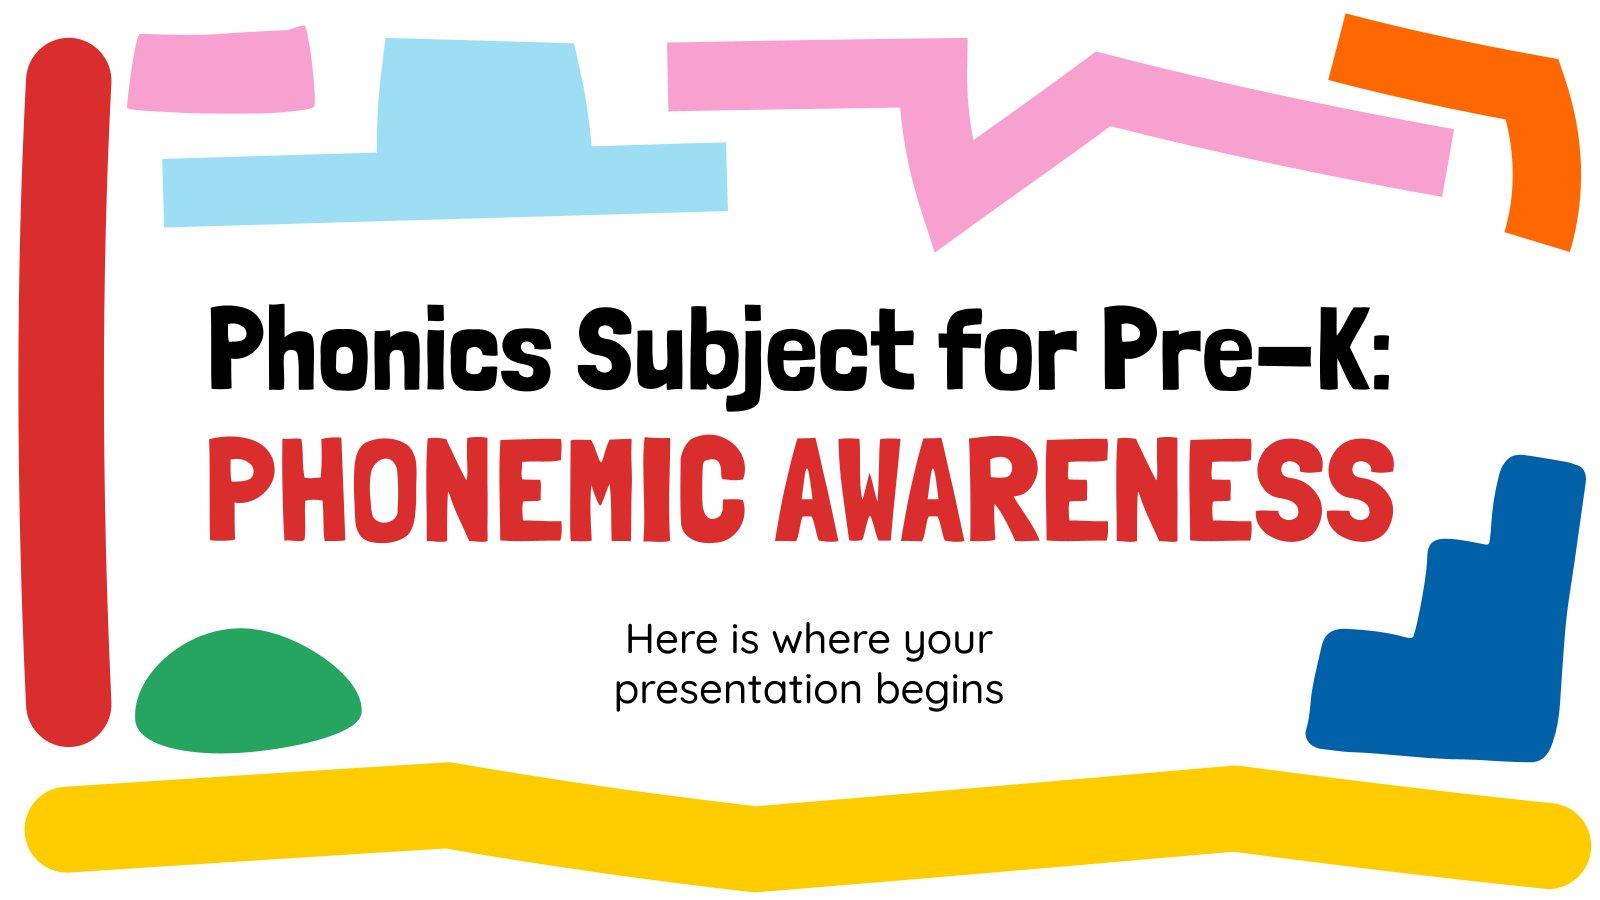 Phonics Subject for Pre-K: Phonemic Awareness presentation template